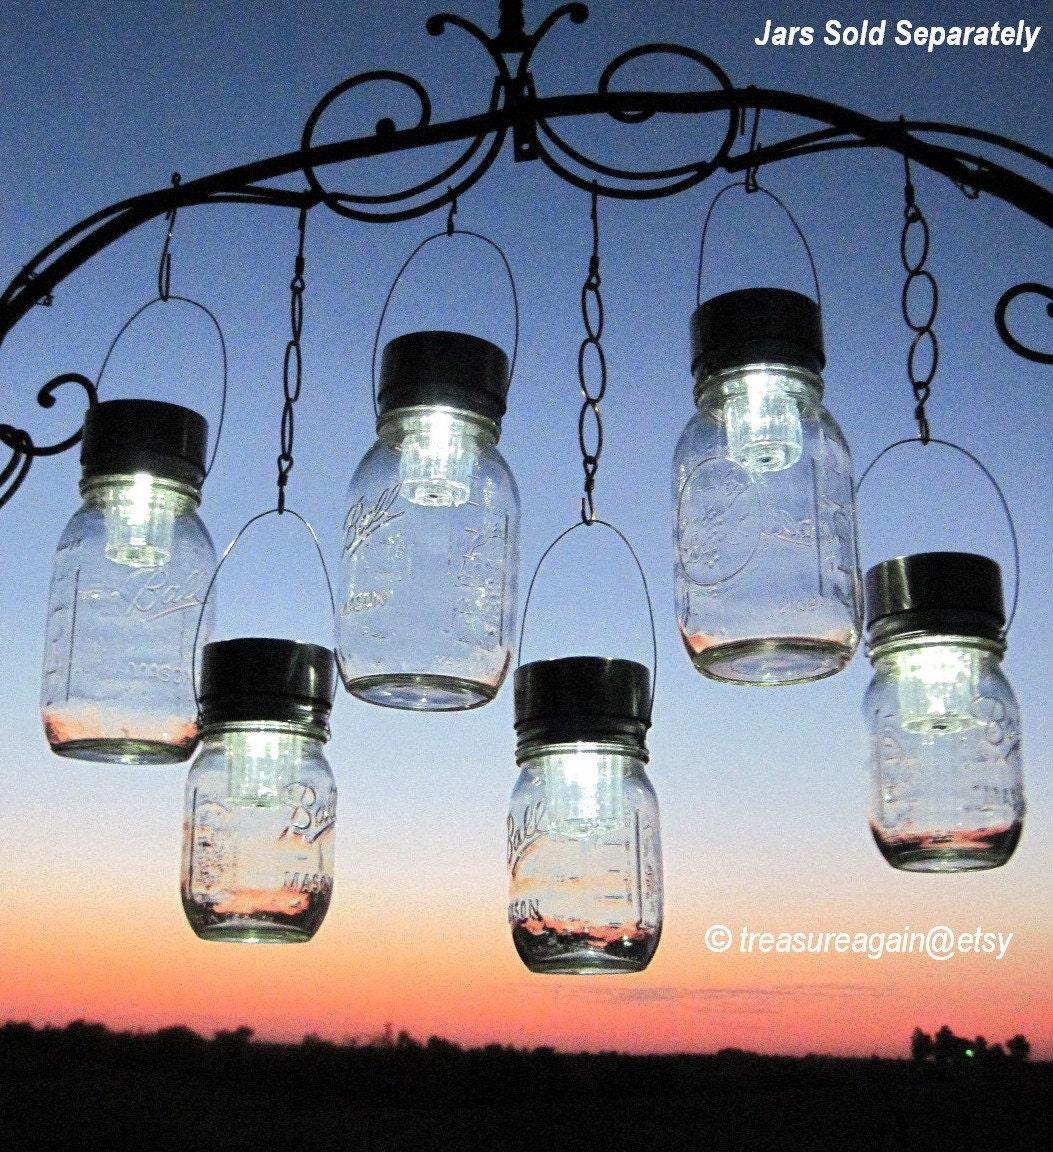 Outdoor event lighting mason jar solar lights wedding lights zoom arubaitofo Images